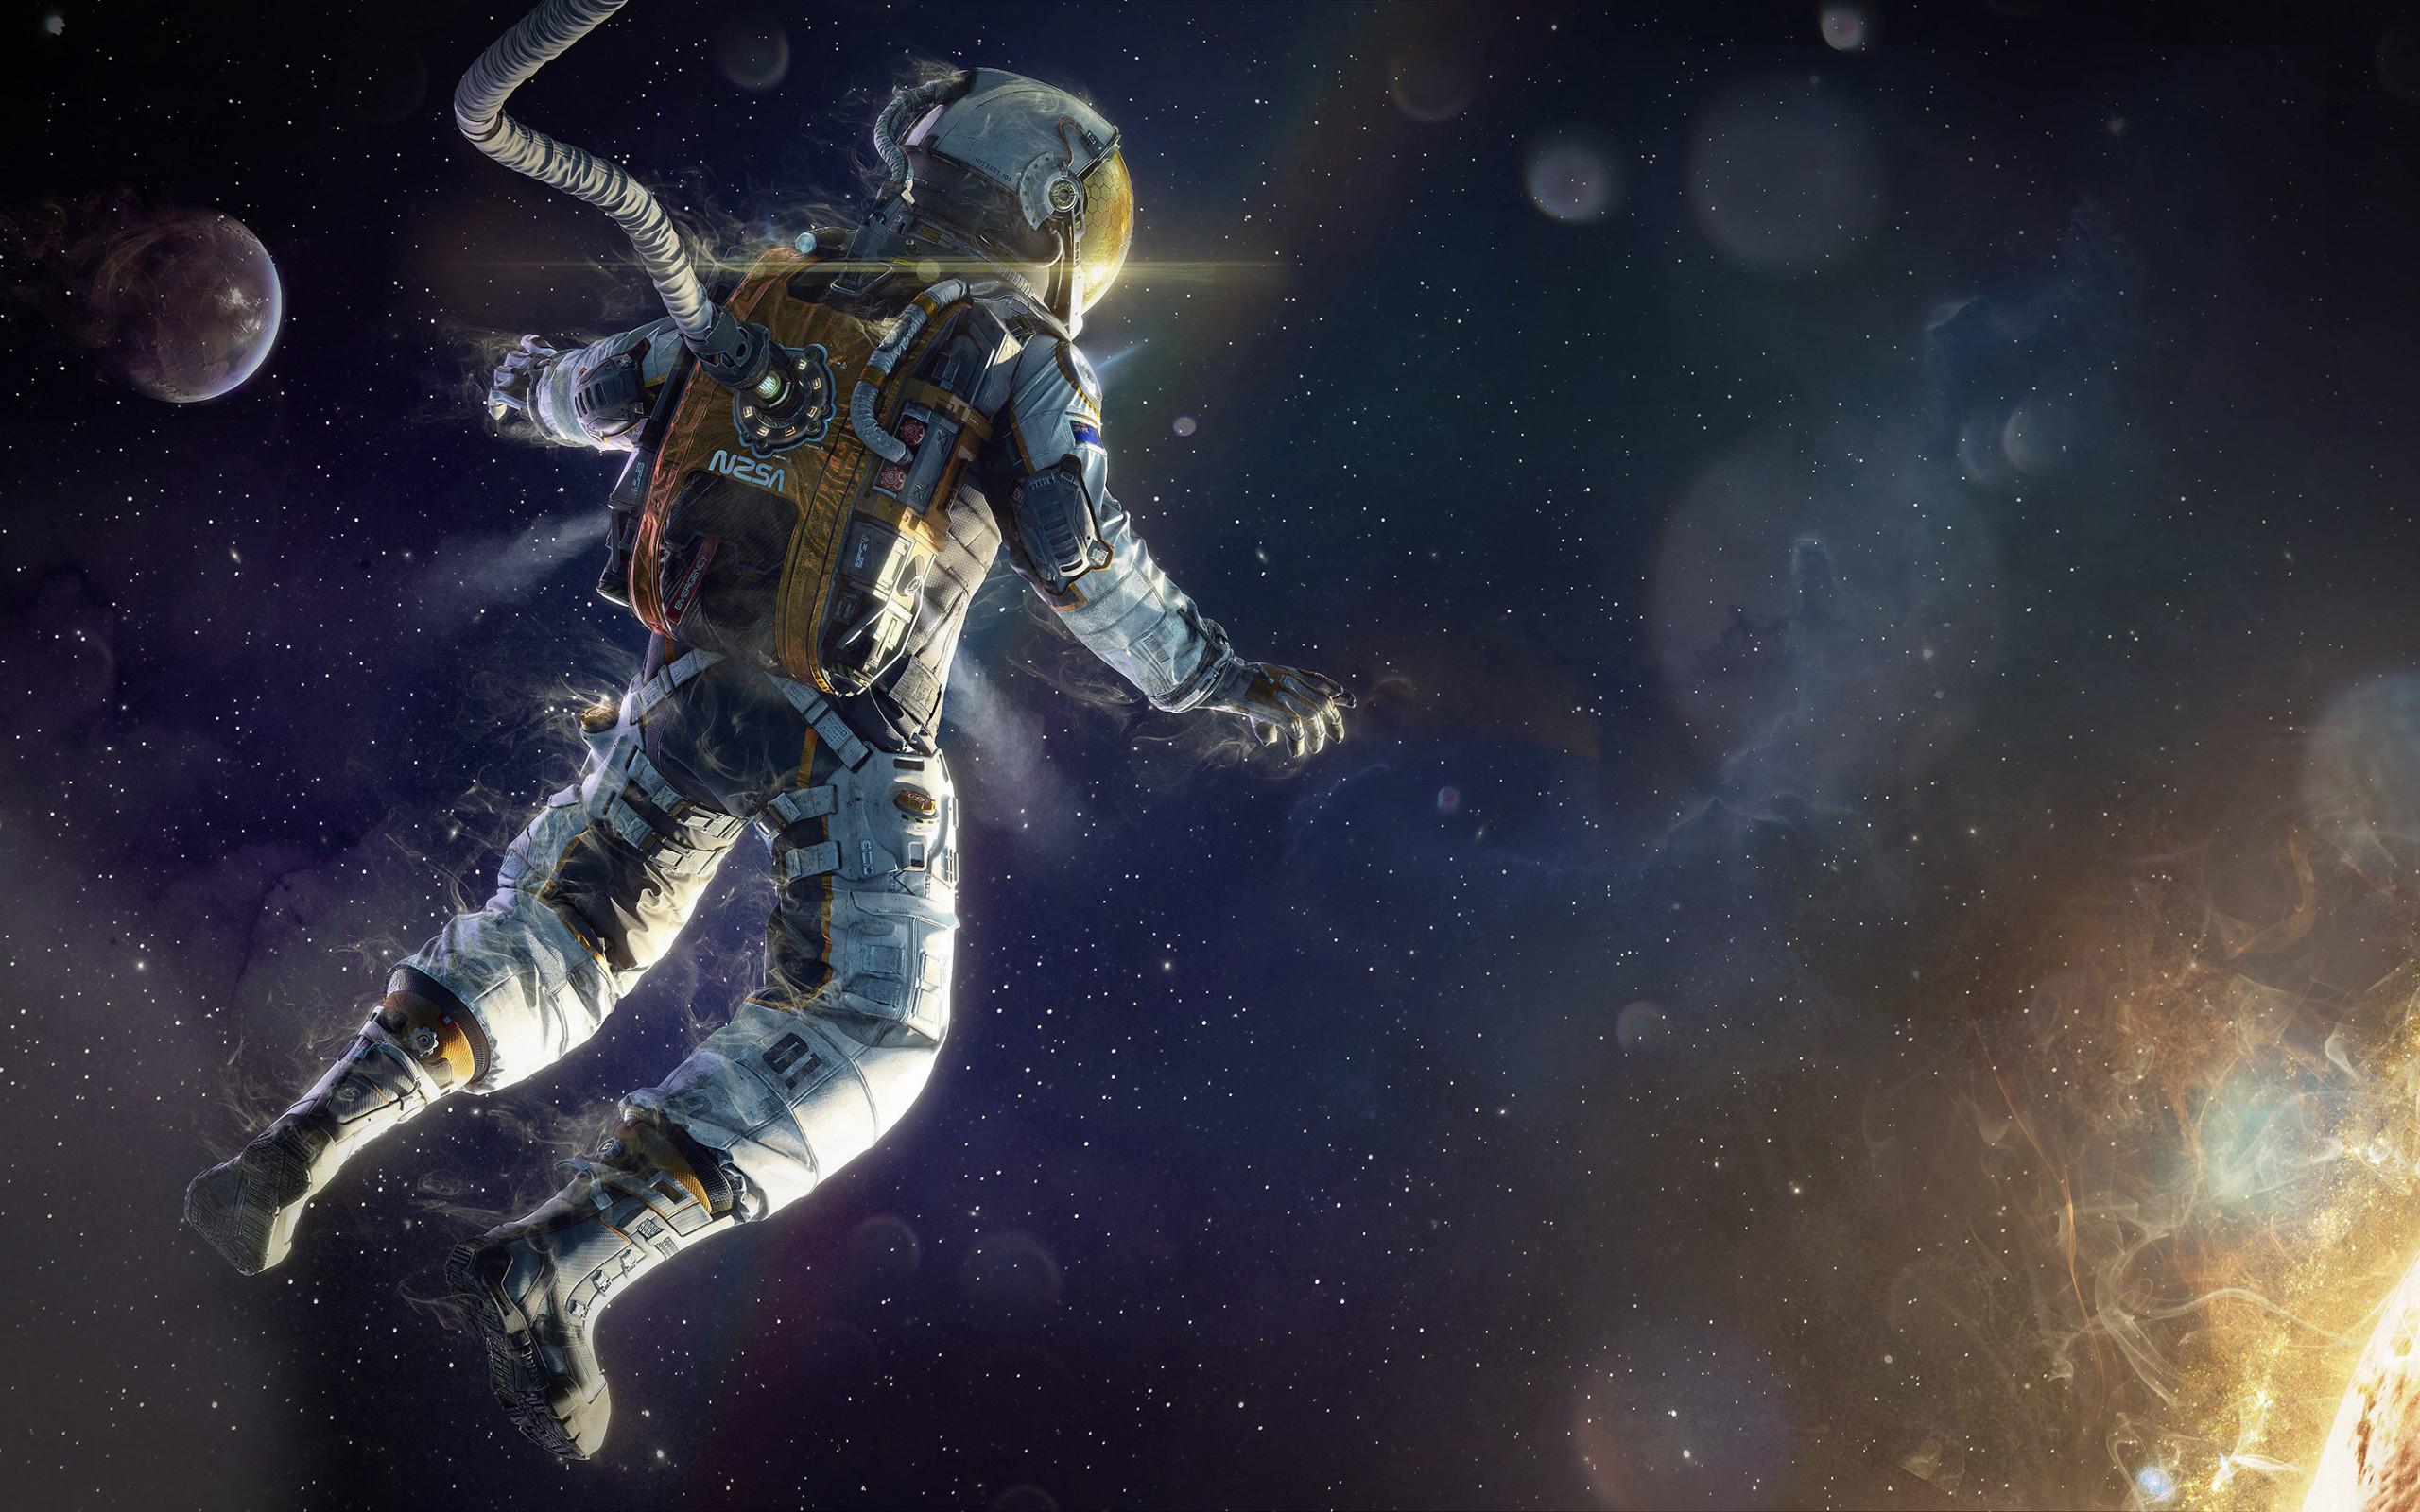 HD Astronaut Wallpaper 70 images 2560x1600